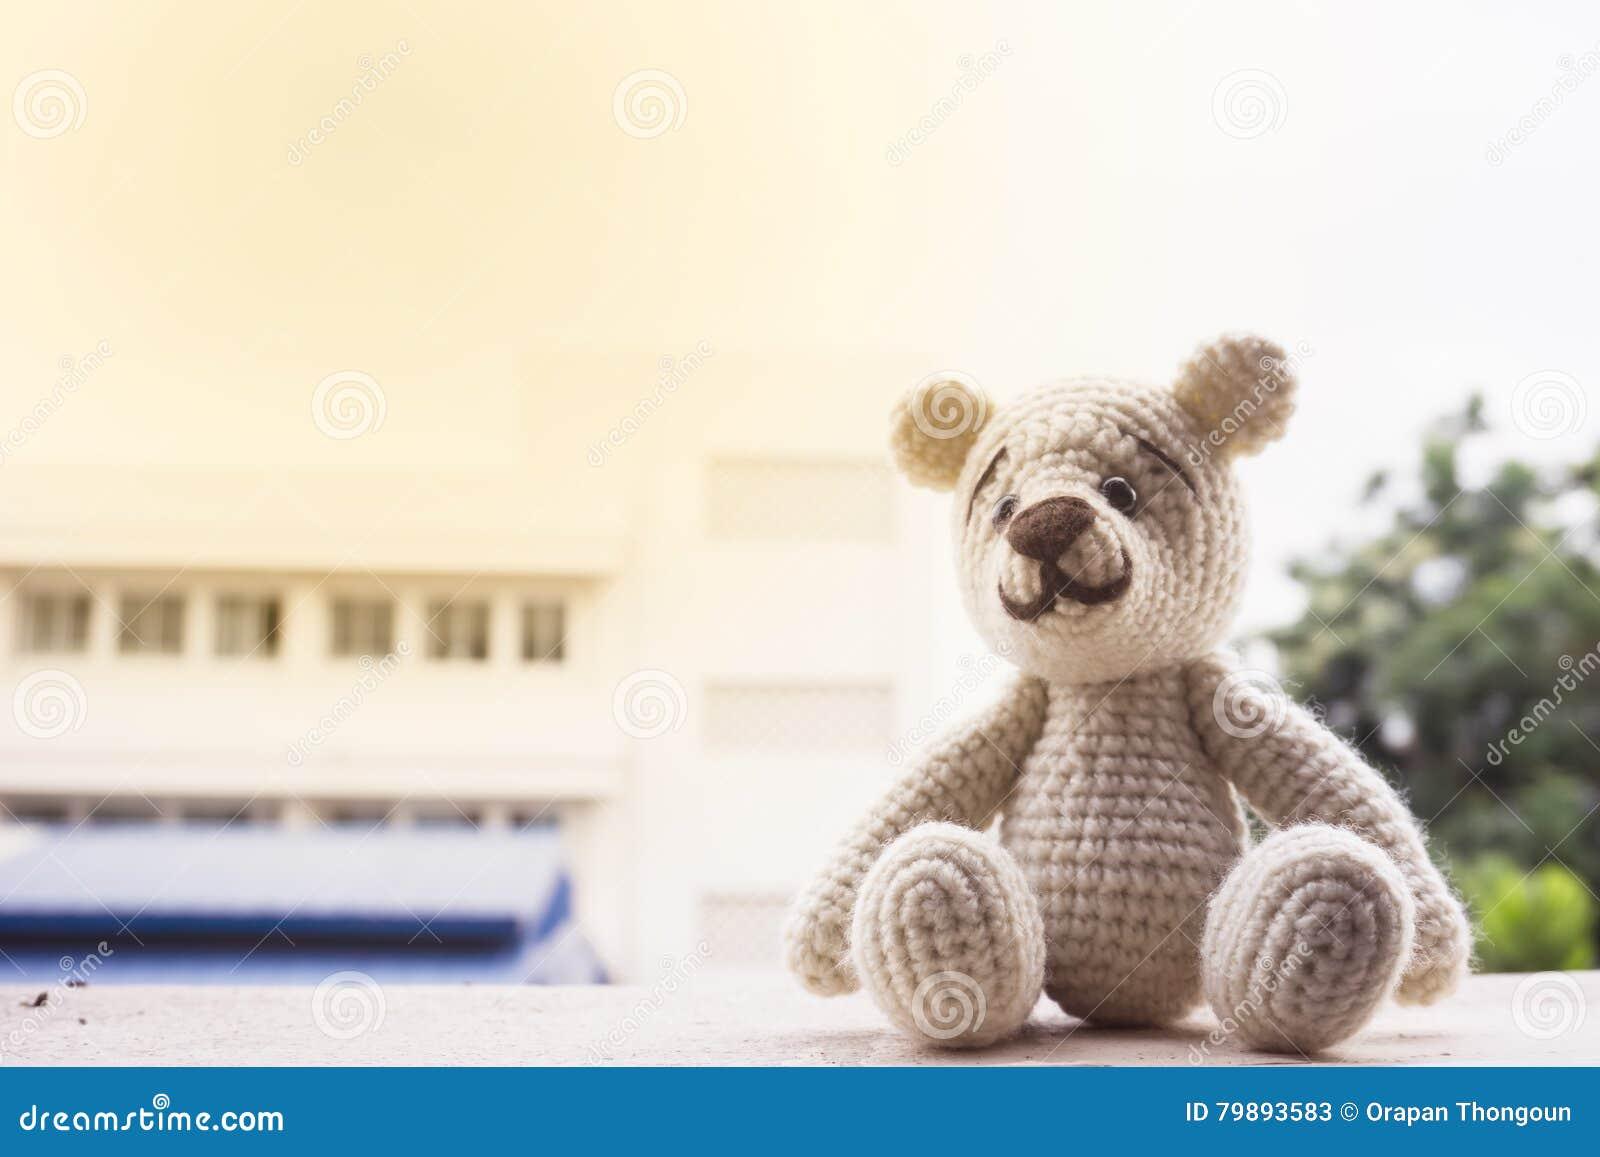 Zan Crochet: Teddy Bear | 957x1300